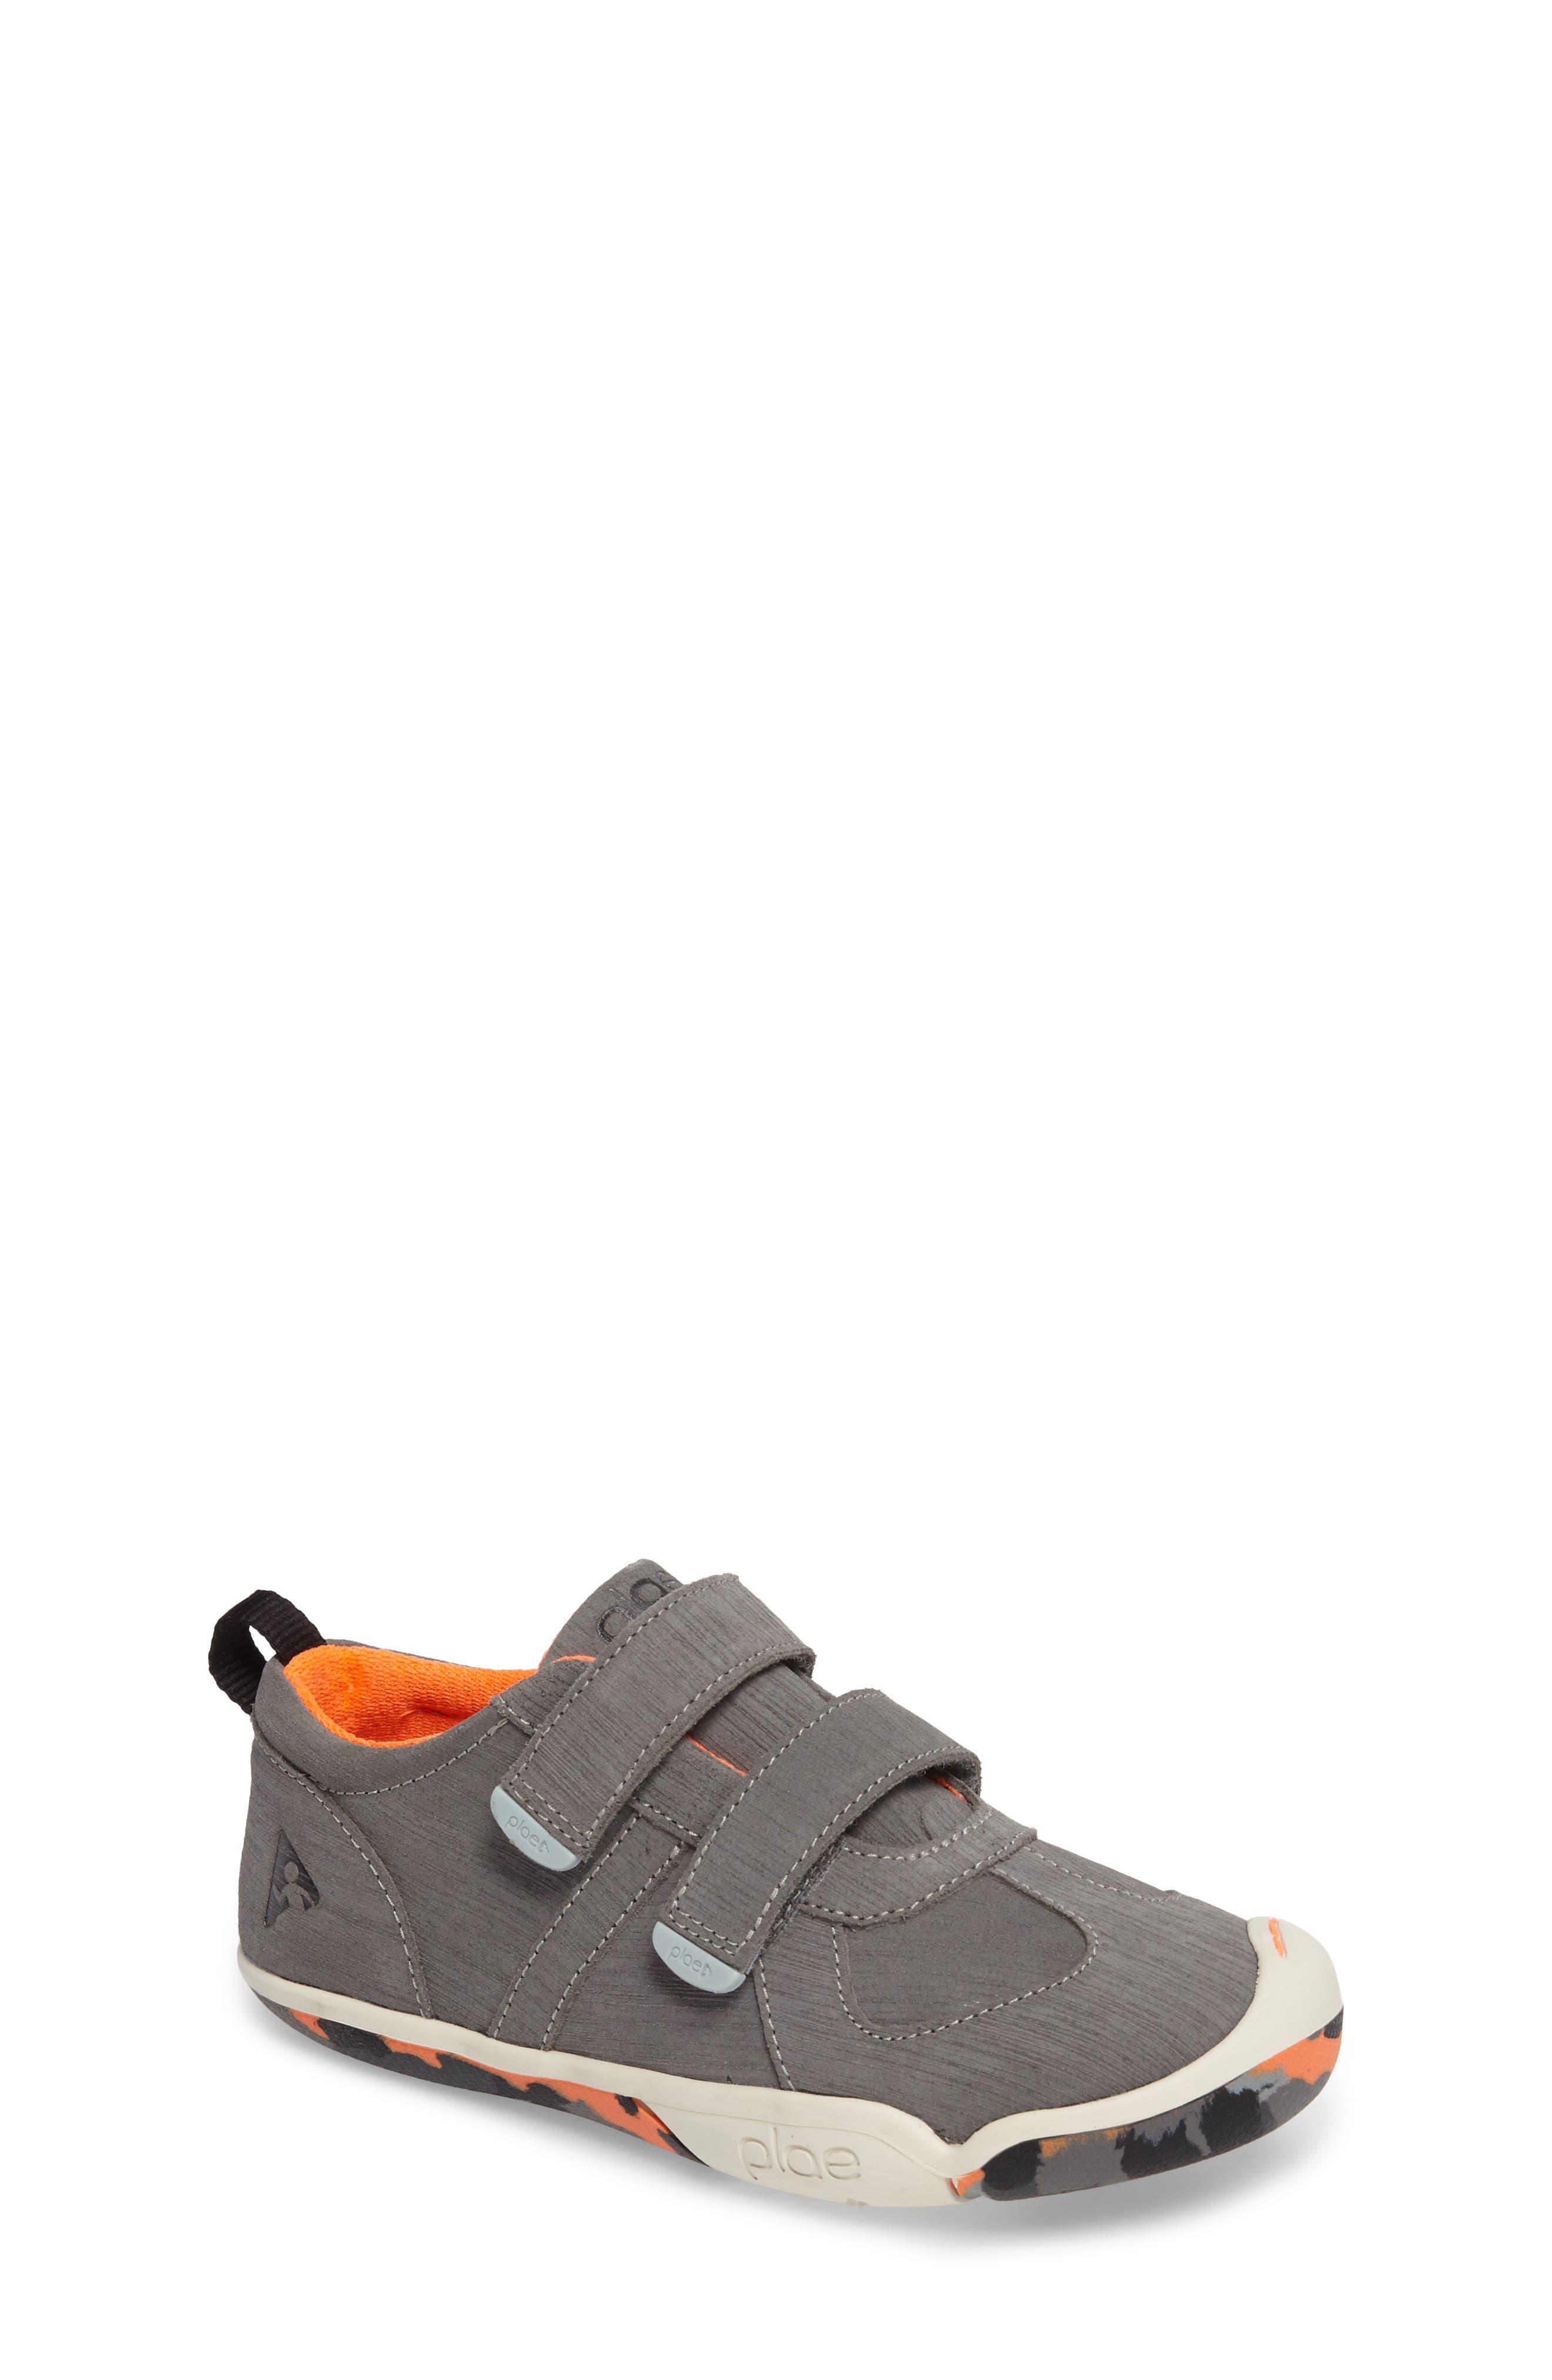 Main Image - PLAE'Nat' Customizable Sneaker(Walker, Toddler, Little Kid & Big Kid)